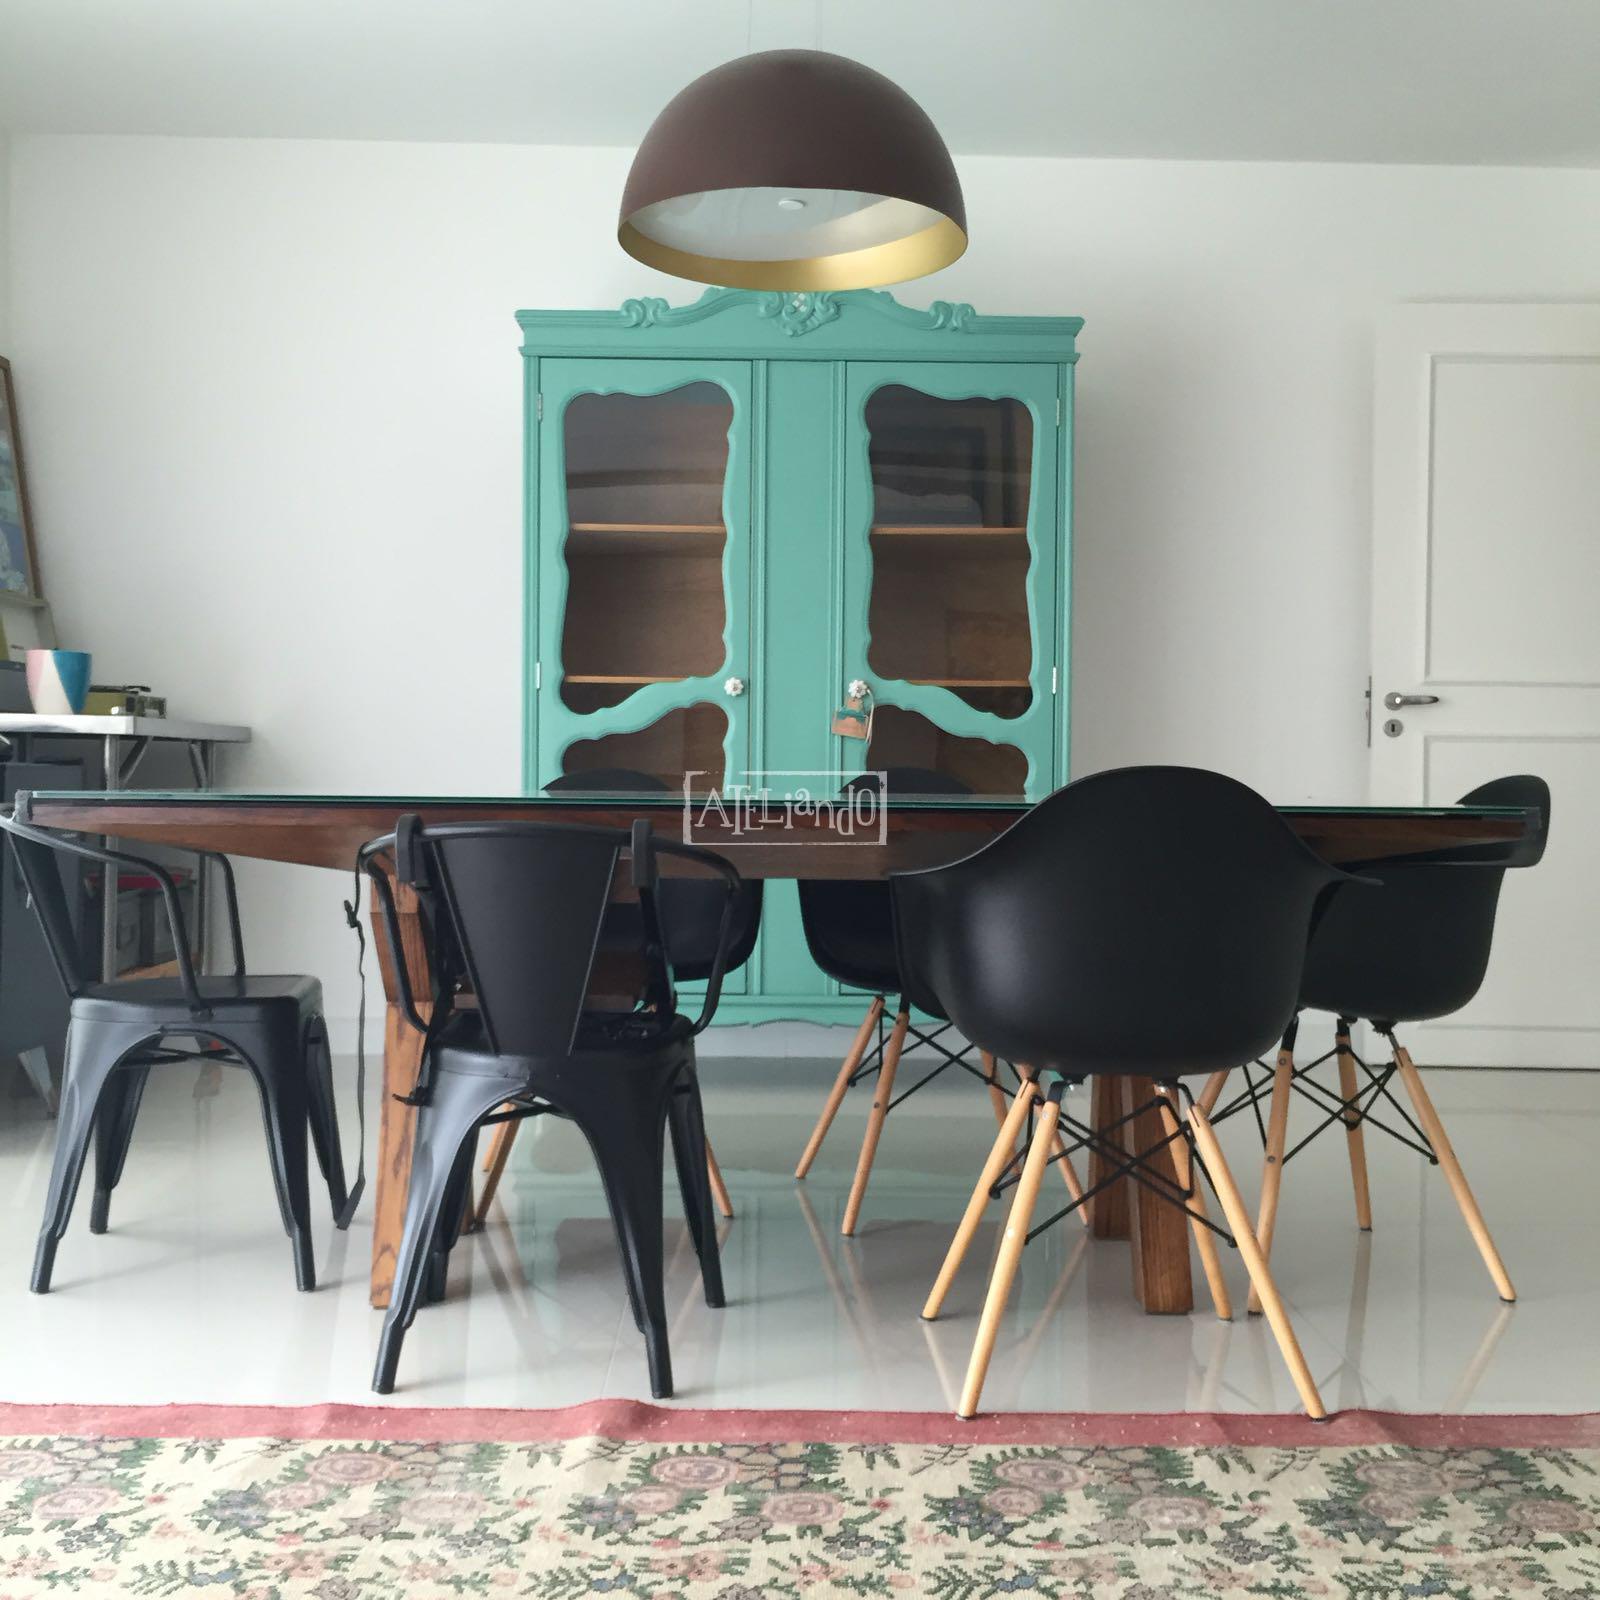 Ateliando customiza o de m veis antigos sala de jantar for Sala de estar retro vintage